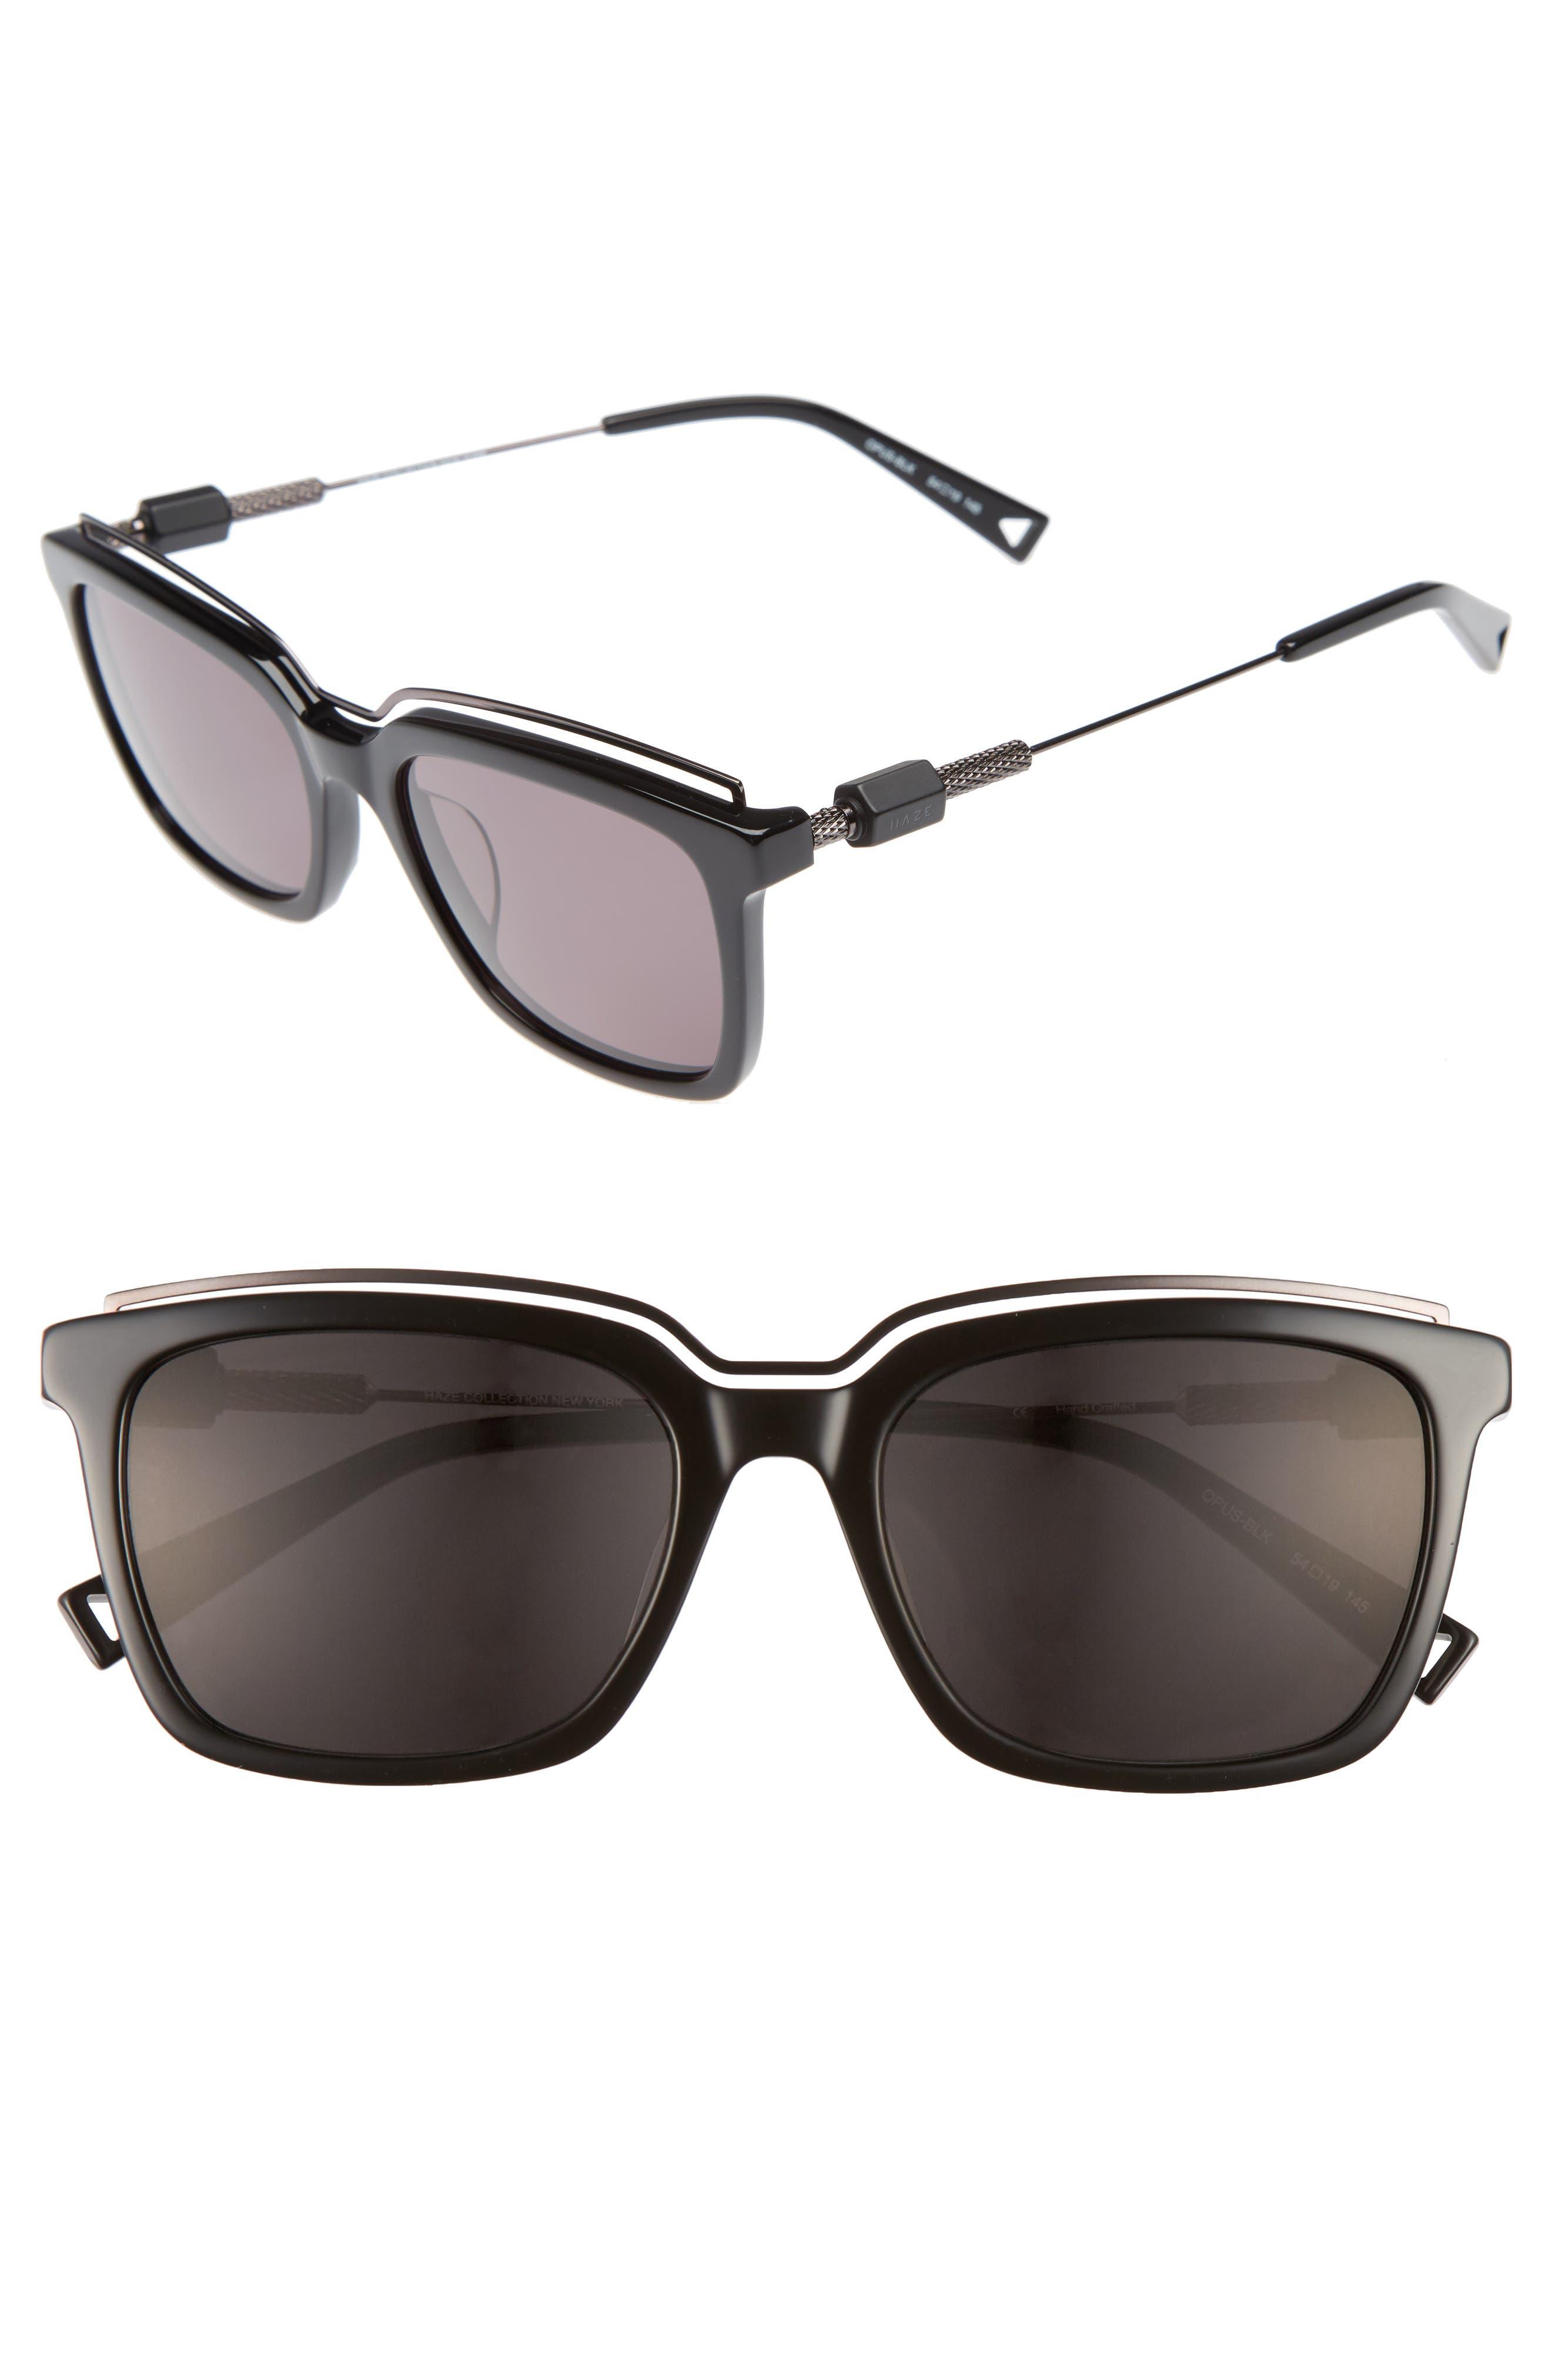 Opus 54mm Sunglasses,                         Main,                         color,